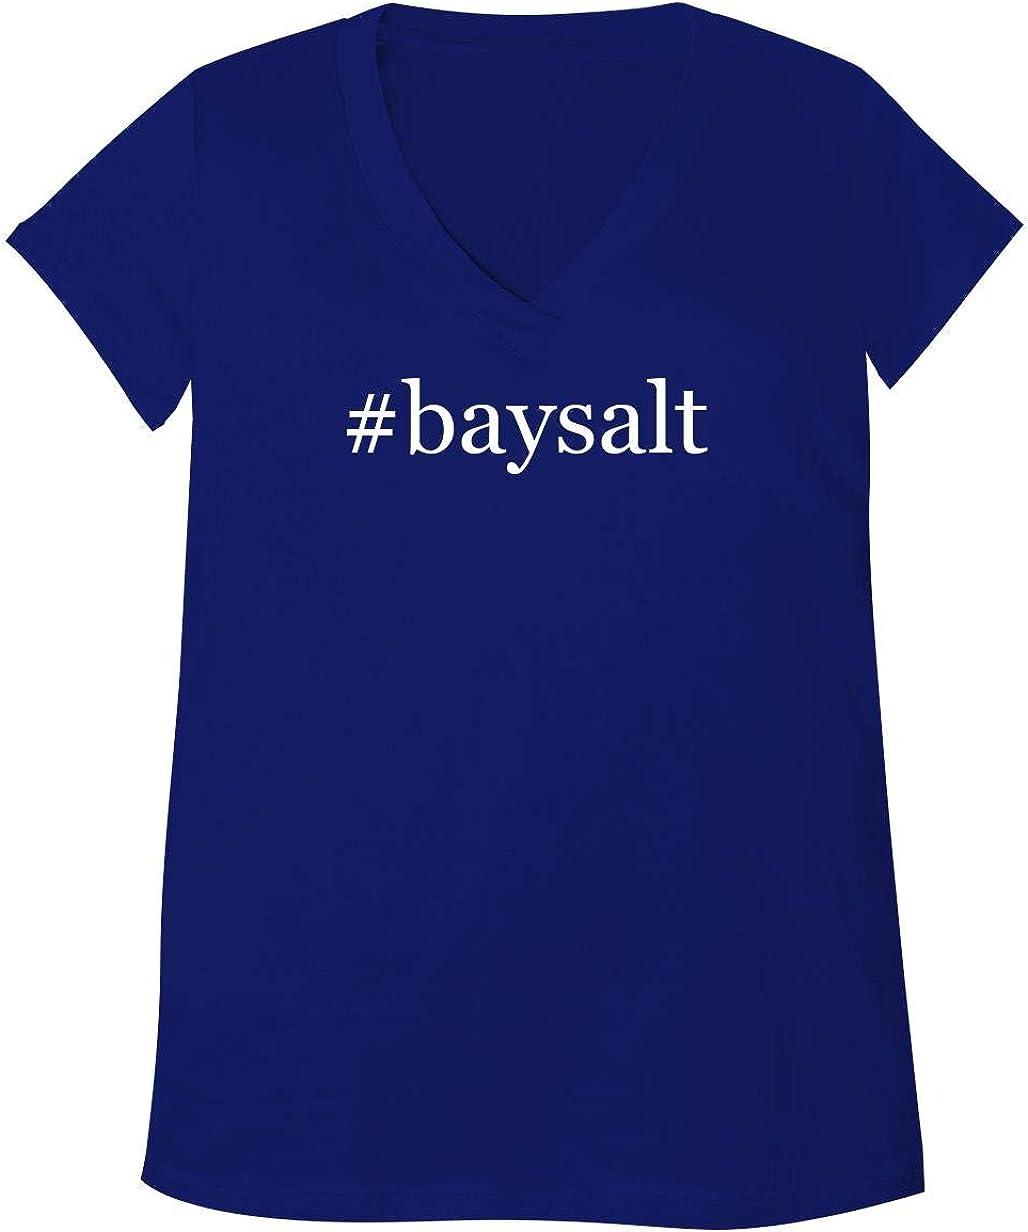 #baysalt - Adult Bella + Canvas B6035 Women's V-Neck T-Shirt 51T7xfcz4IL